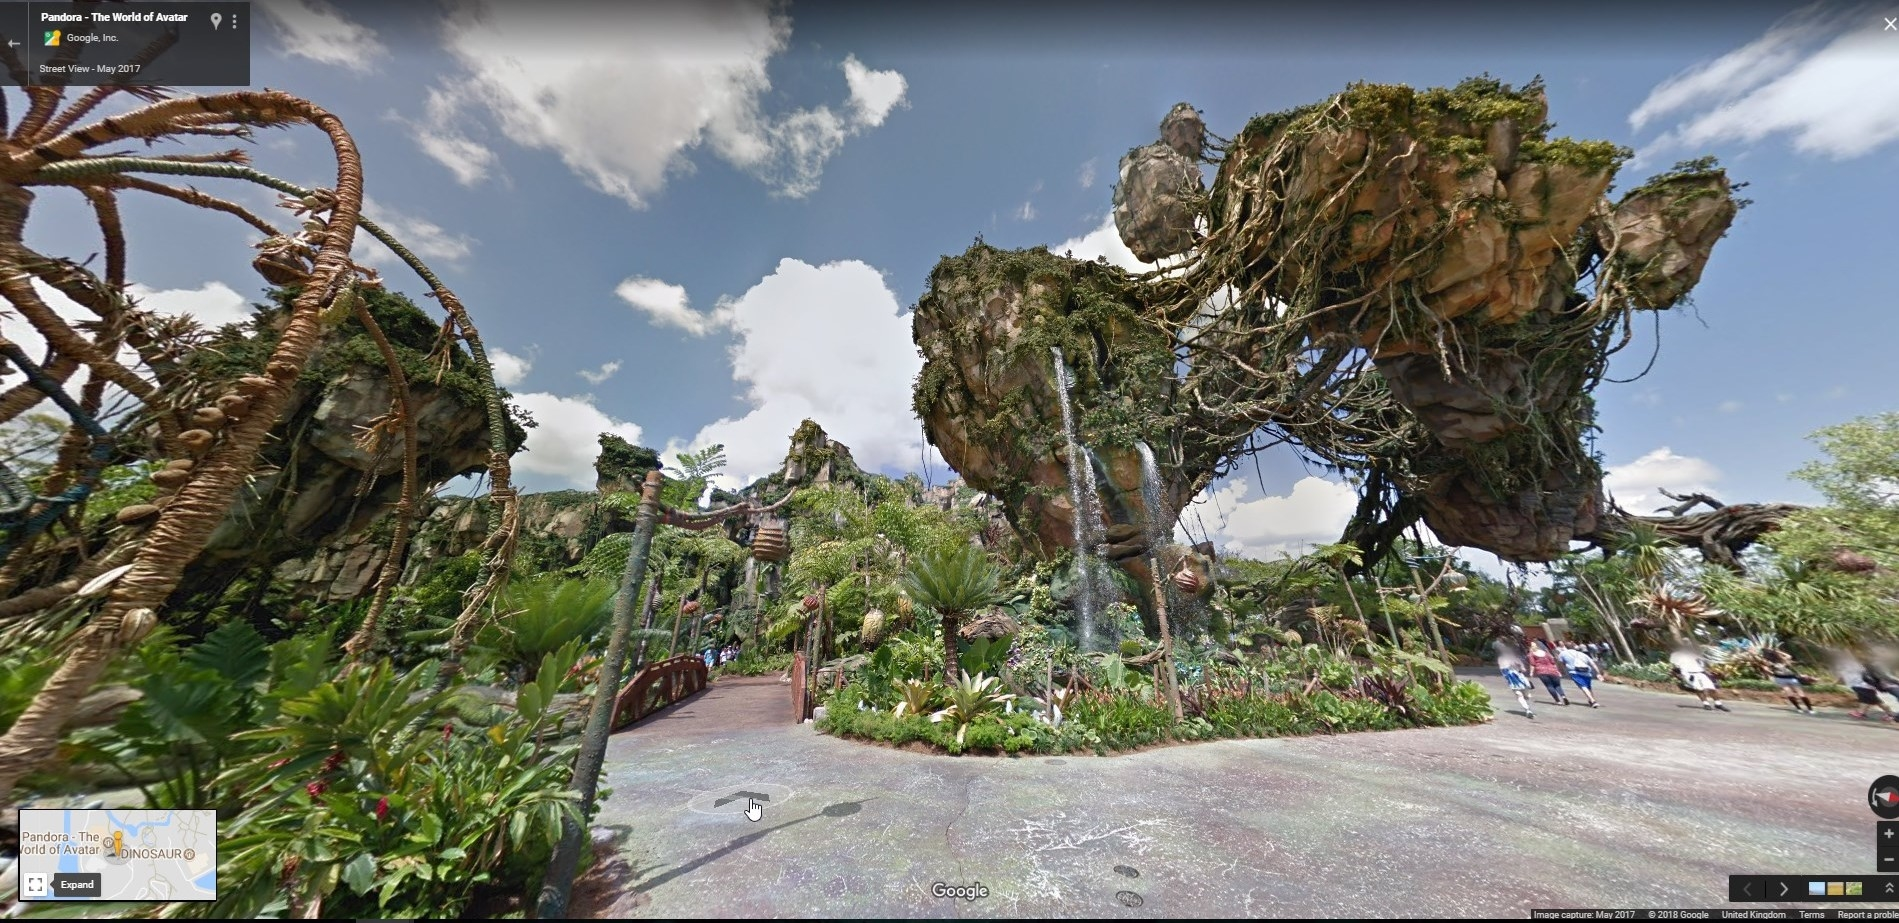 Pandora-Disneyland